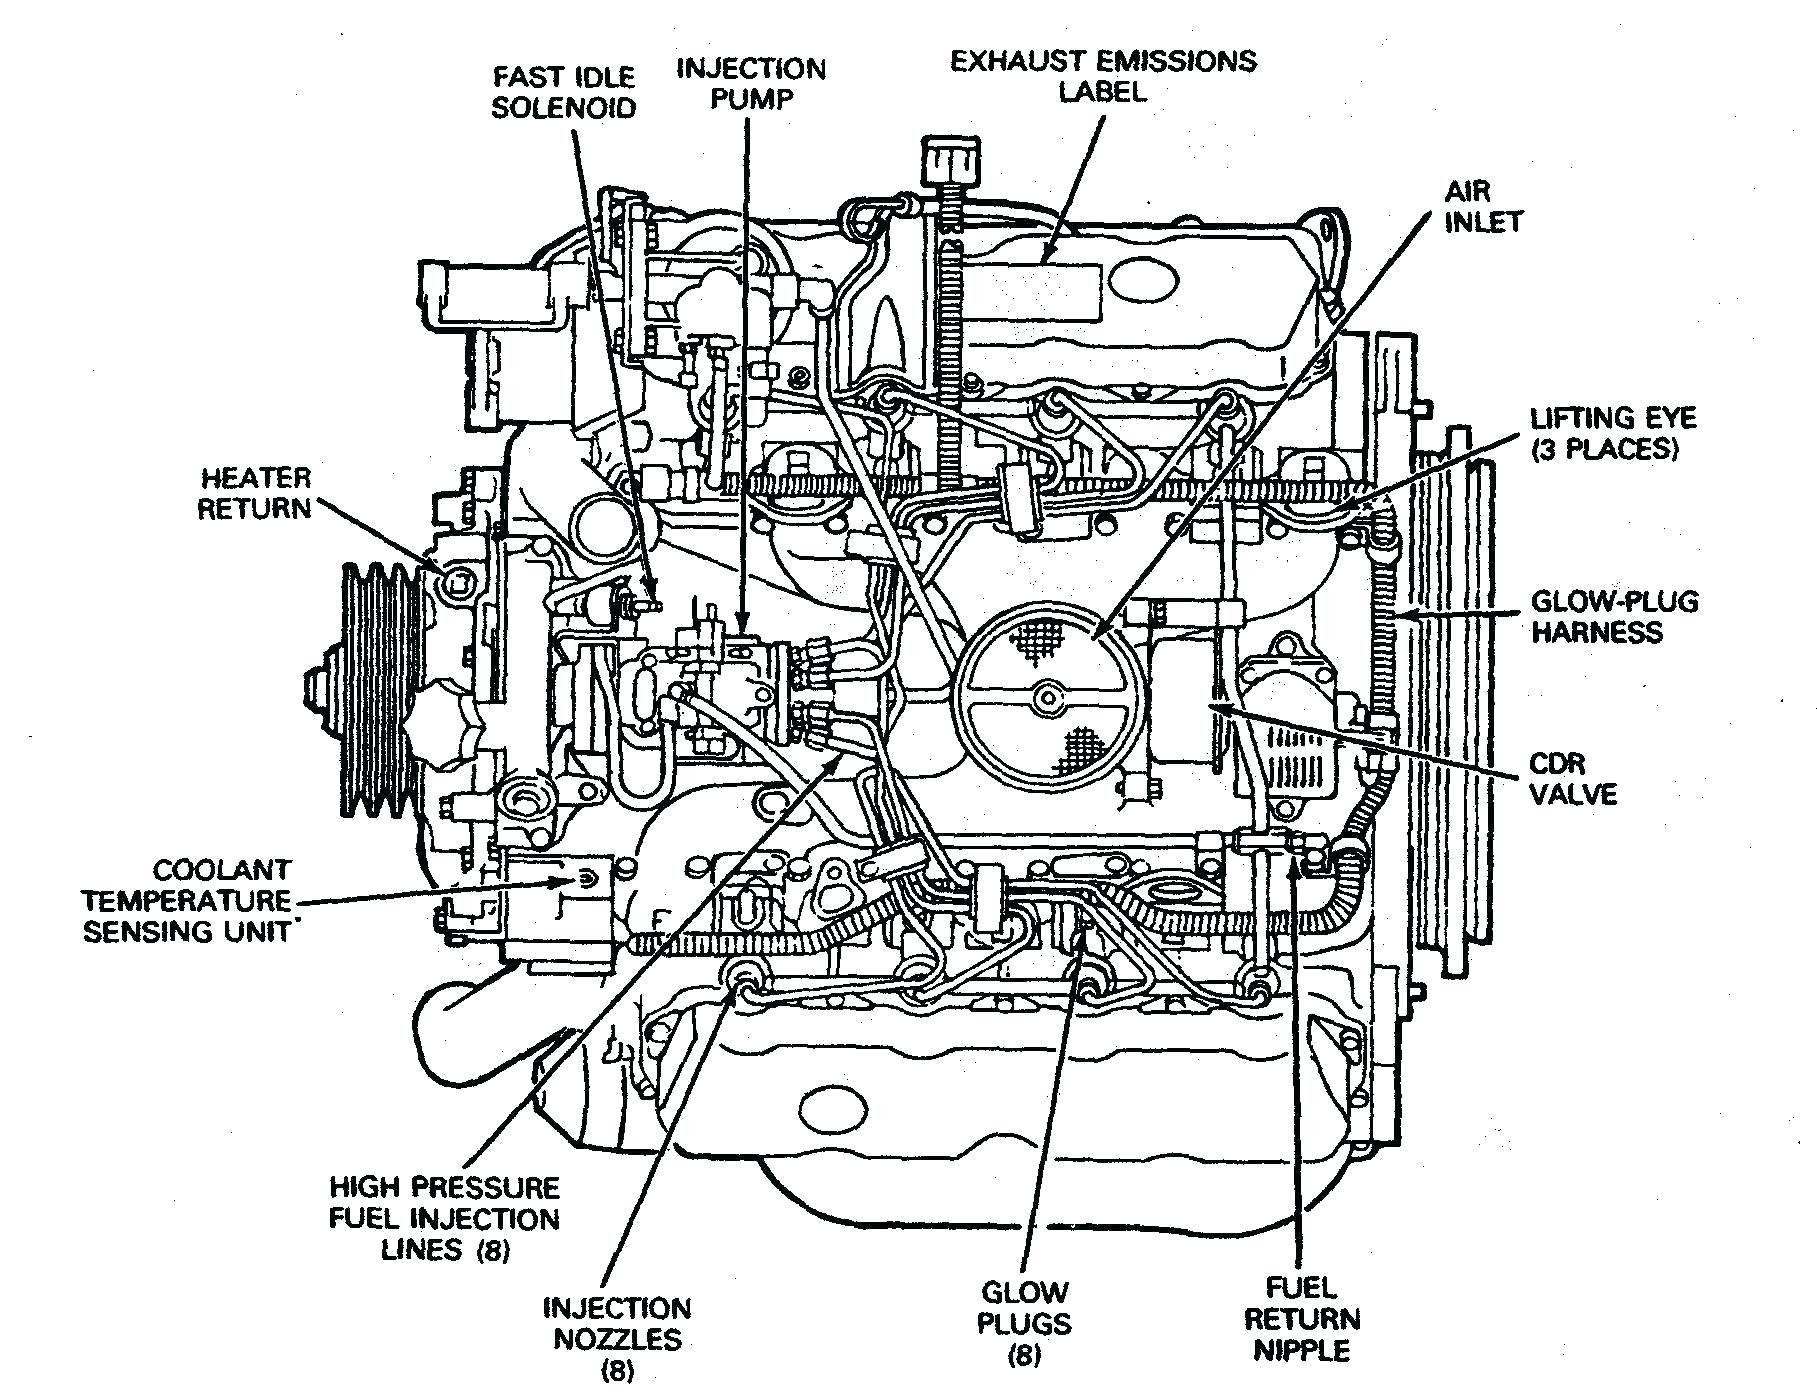 vw engine parts diagram my wiring diagram rh detoxicrecenze com vw beetle engine parts diagram vw passat engine parts diagram